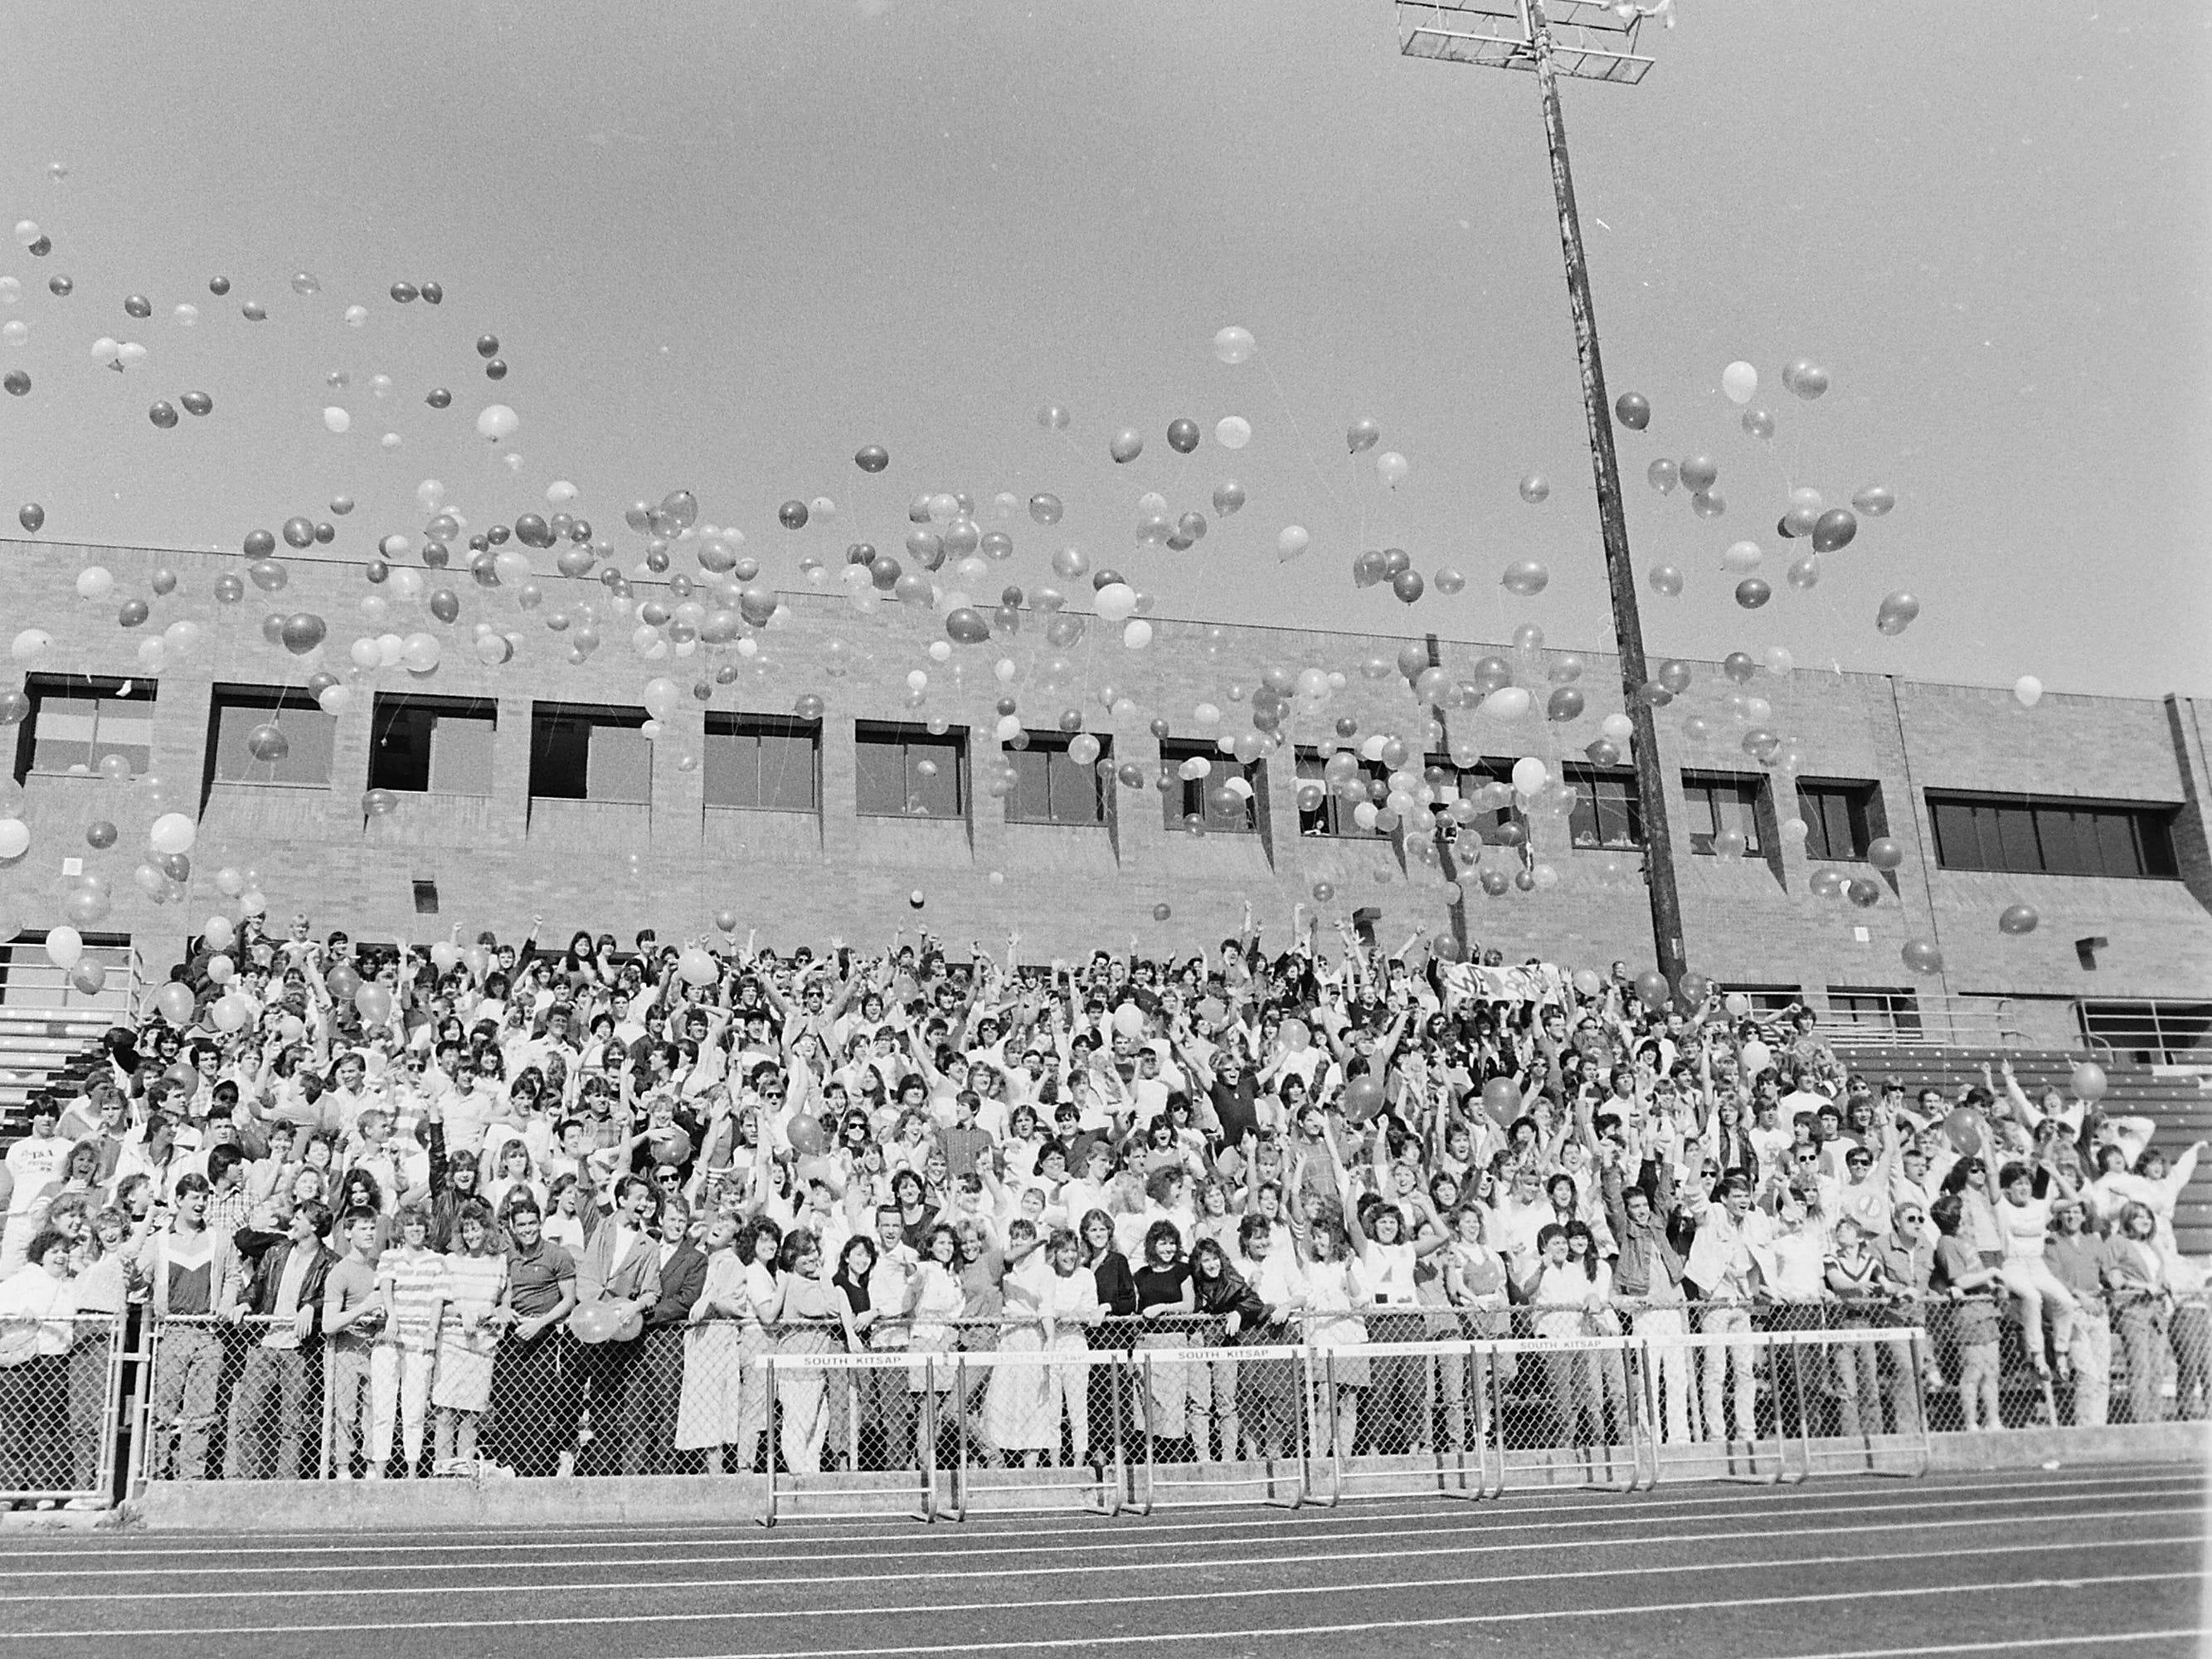 05/26/87SK Grads Release Balloons